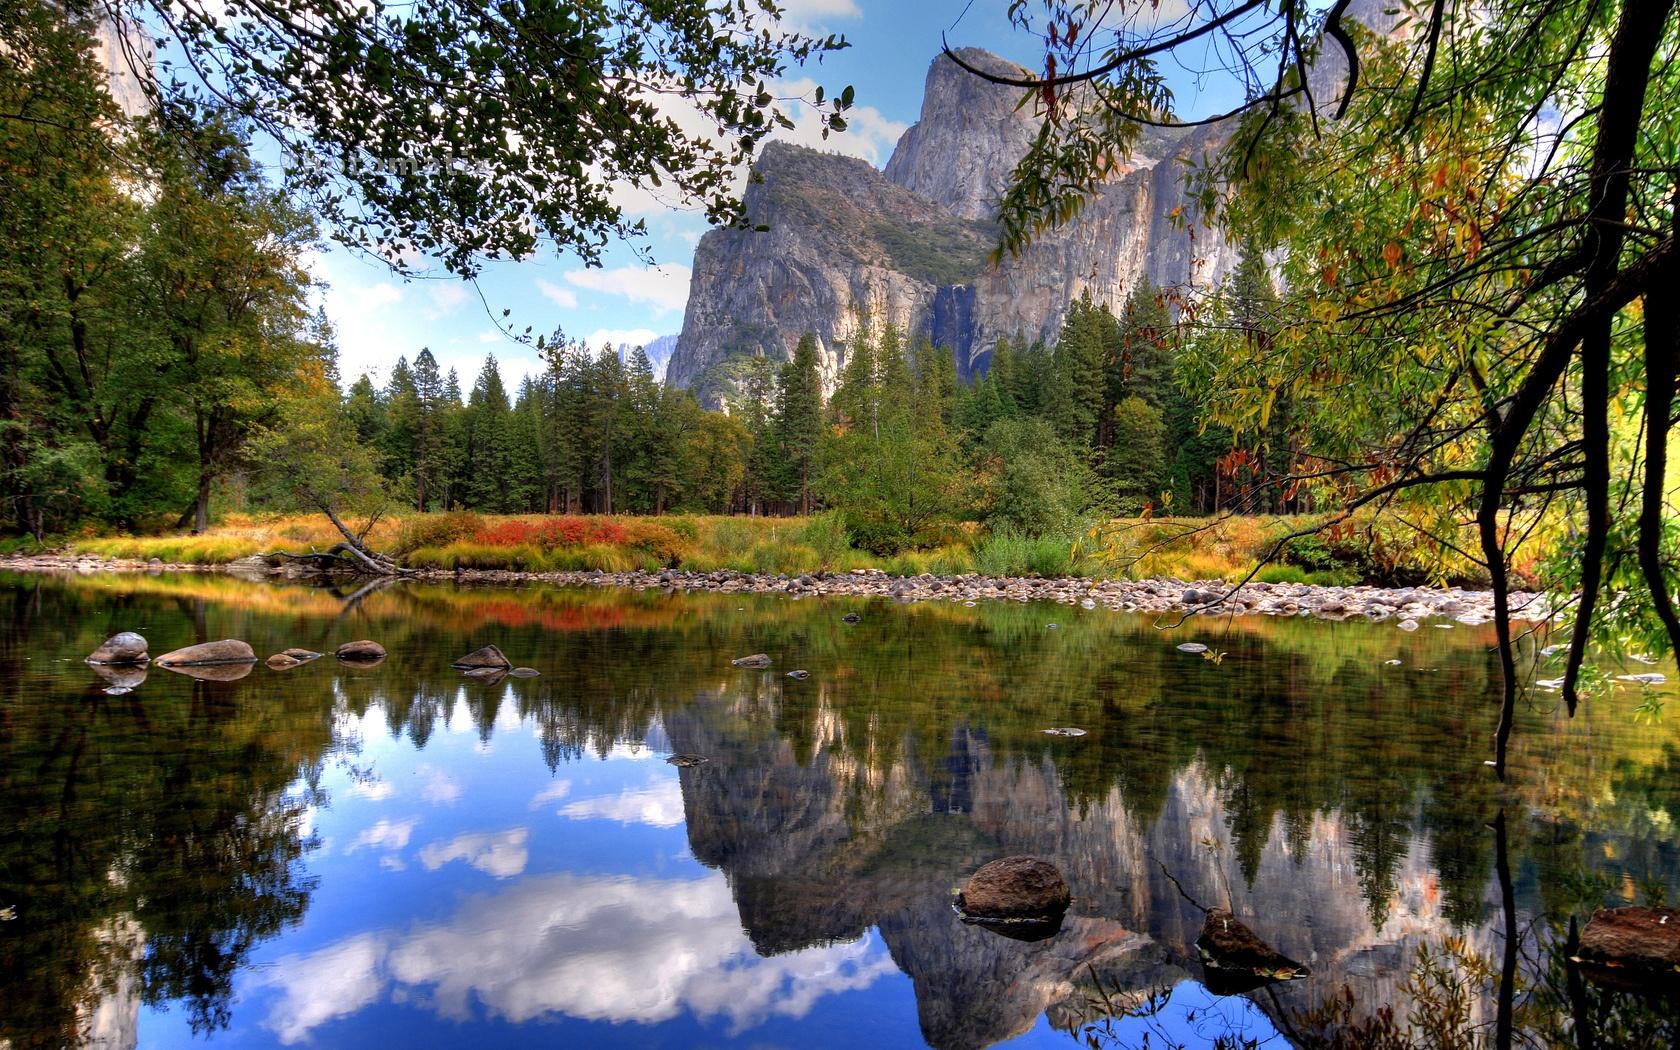 Yosemite National Park Wallpapers   1680x1050   1131901 1680x1050